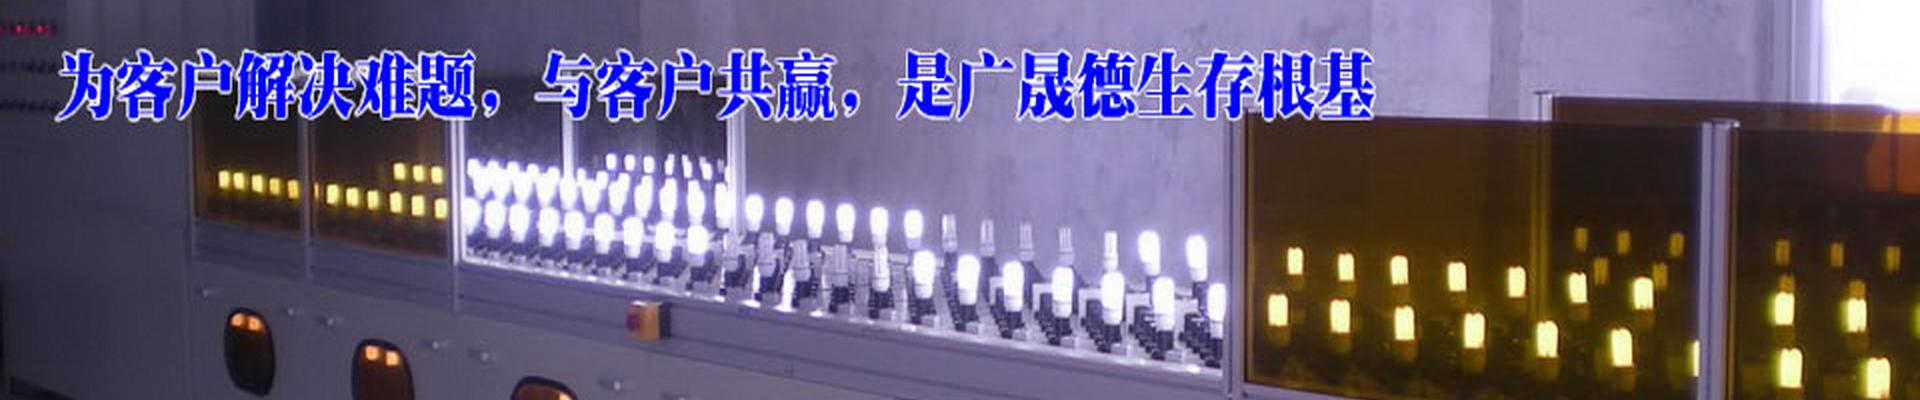 LED球泡燈老化線